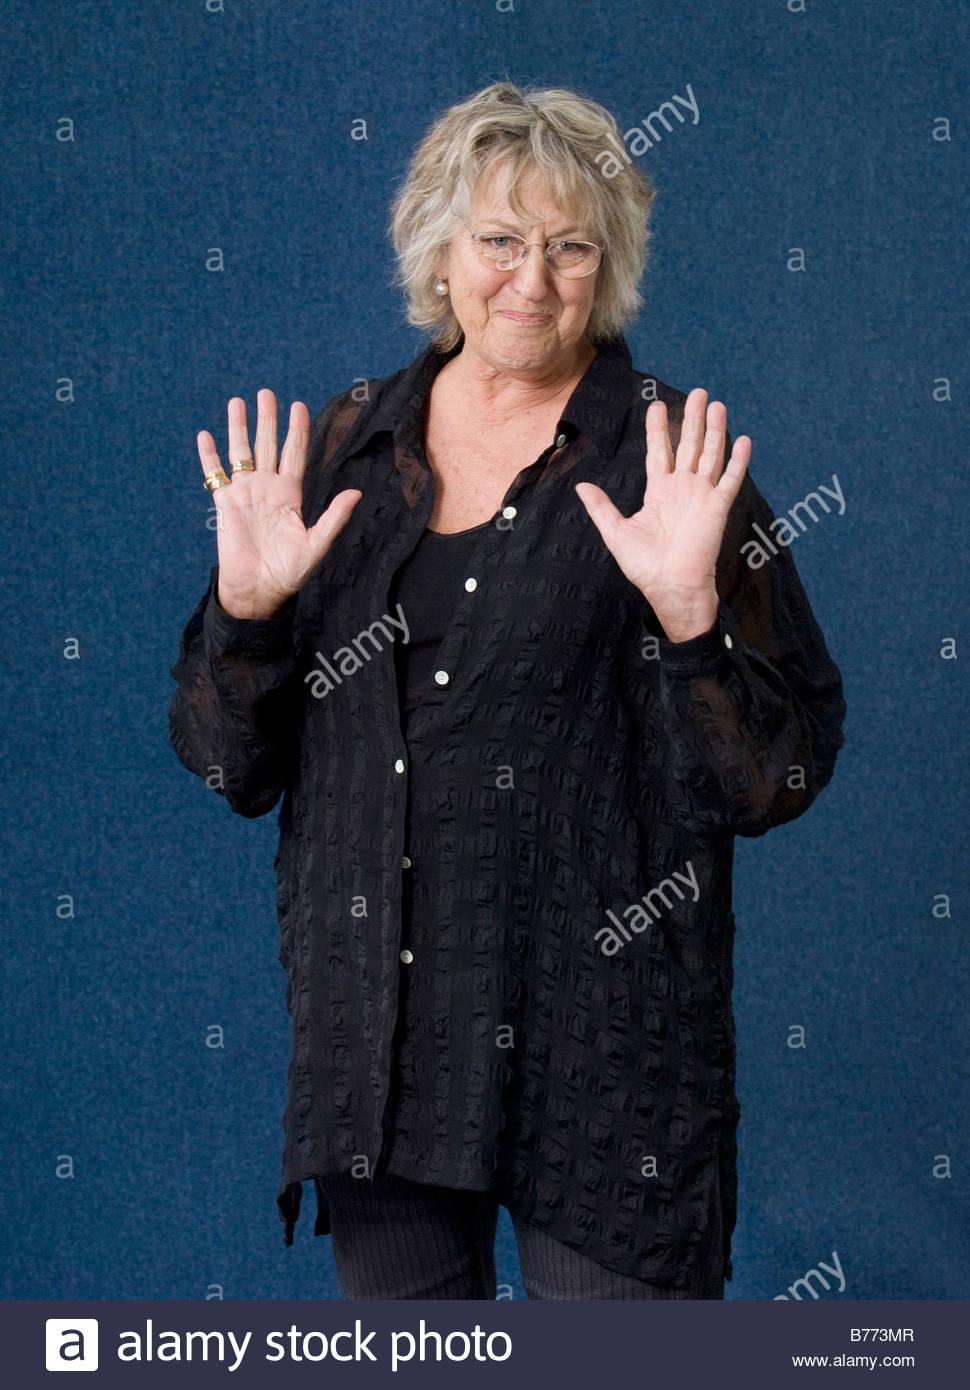 Germaine Greer at The Edinburgh Book Festival 2007 - Stock Image